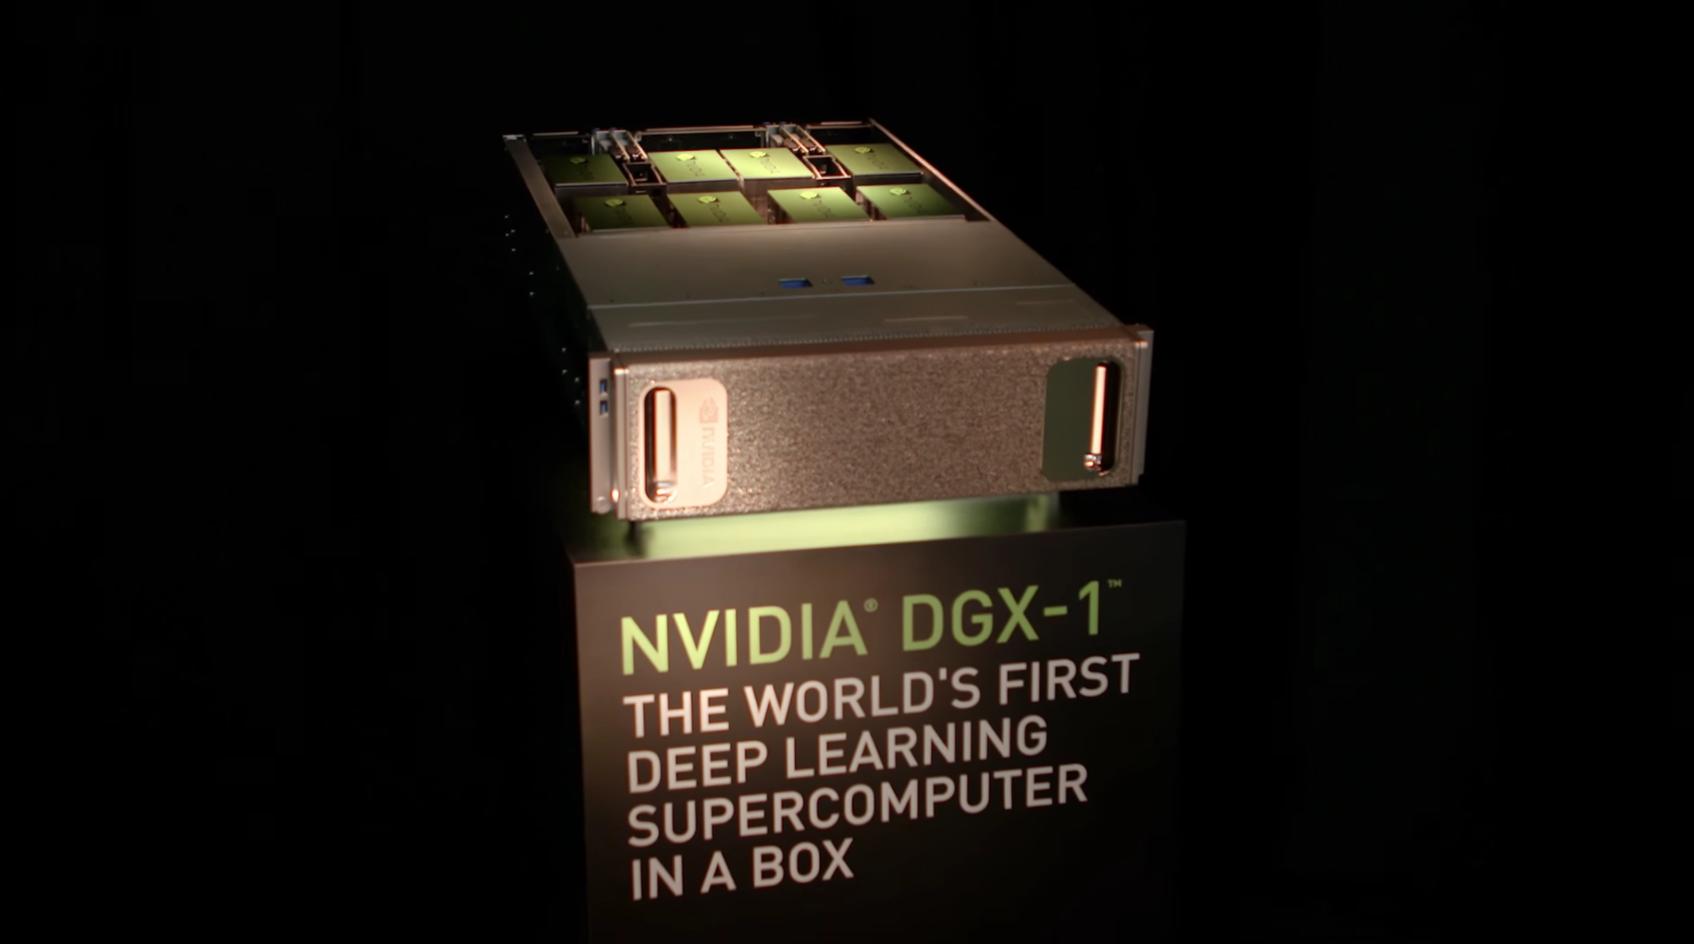 nvidias dgx 1 supercomputer packs - HD1694×944